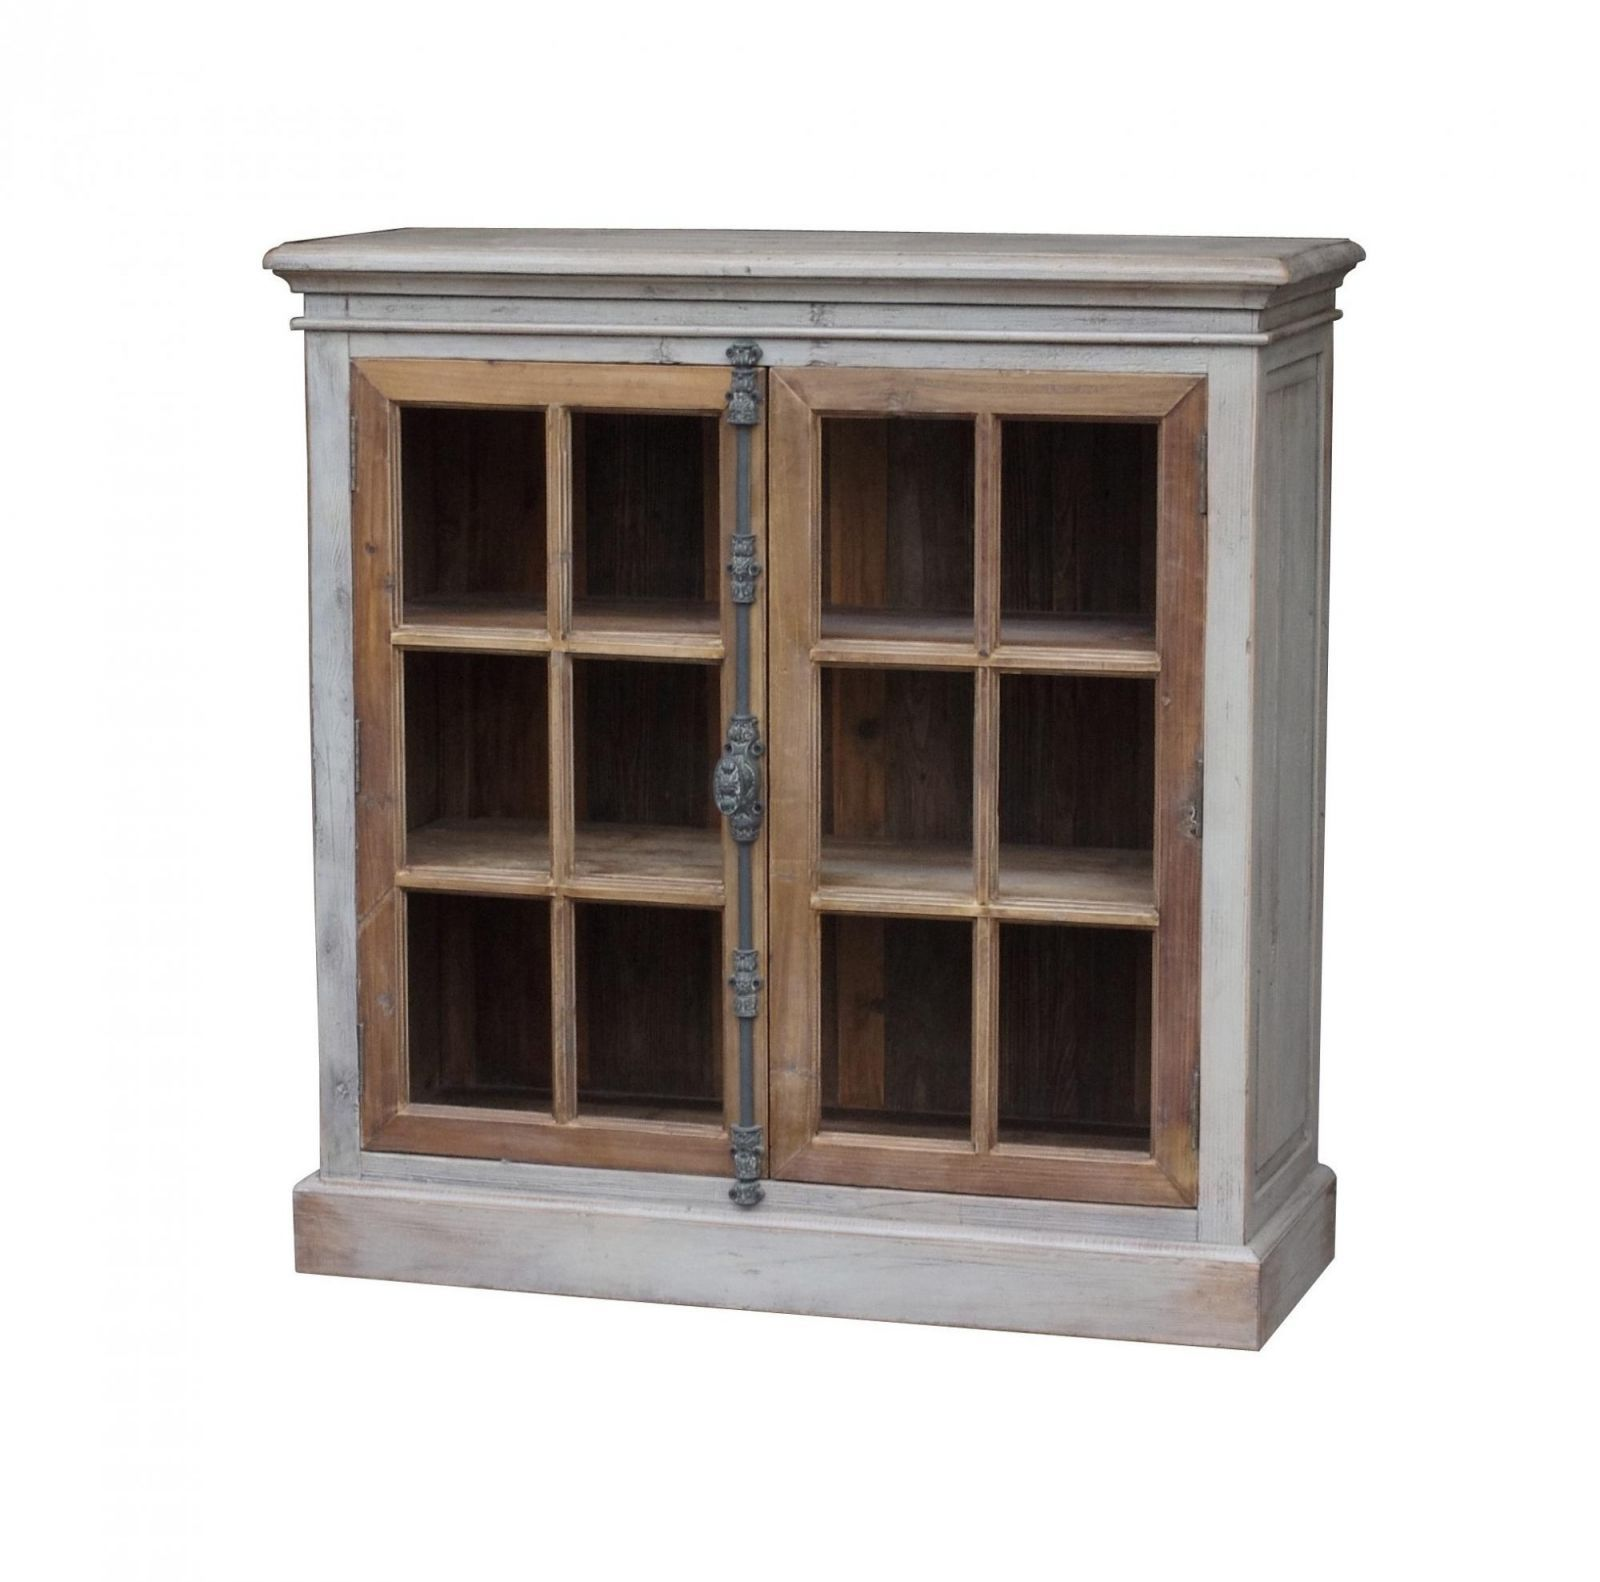 Restoration hardware style french casement glass door for Restoration hardware furniture manufacturer